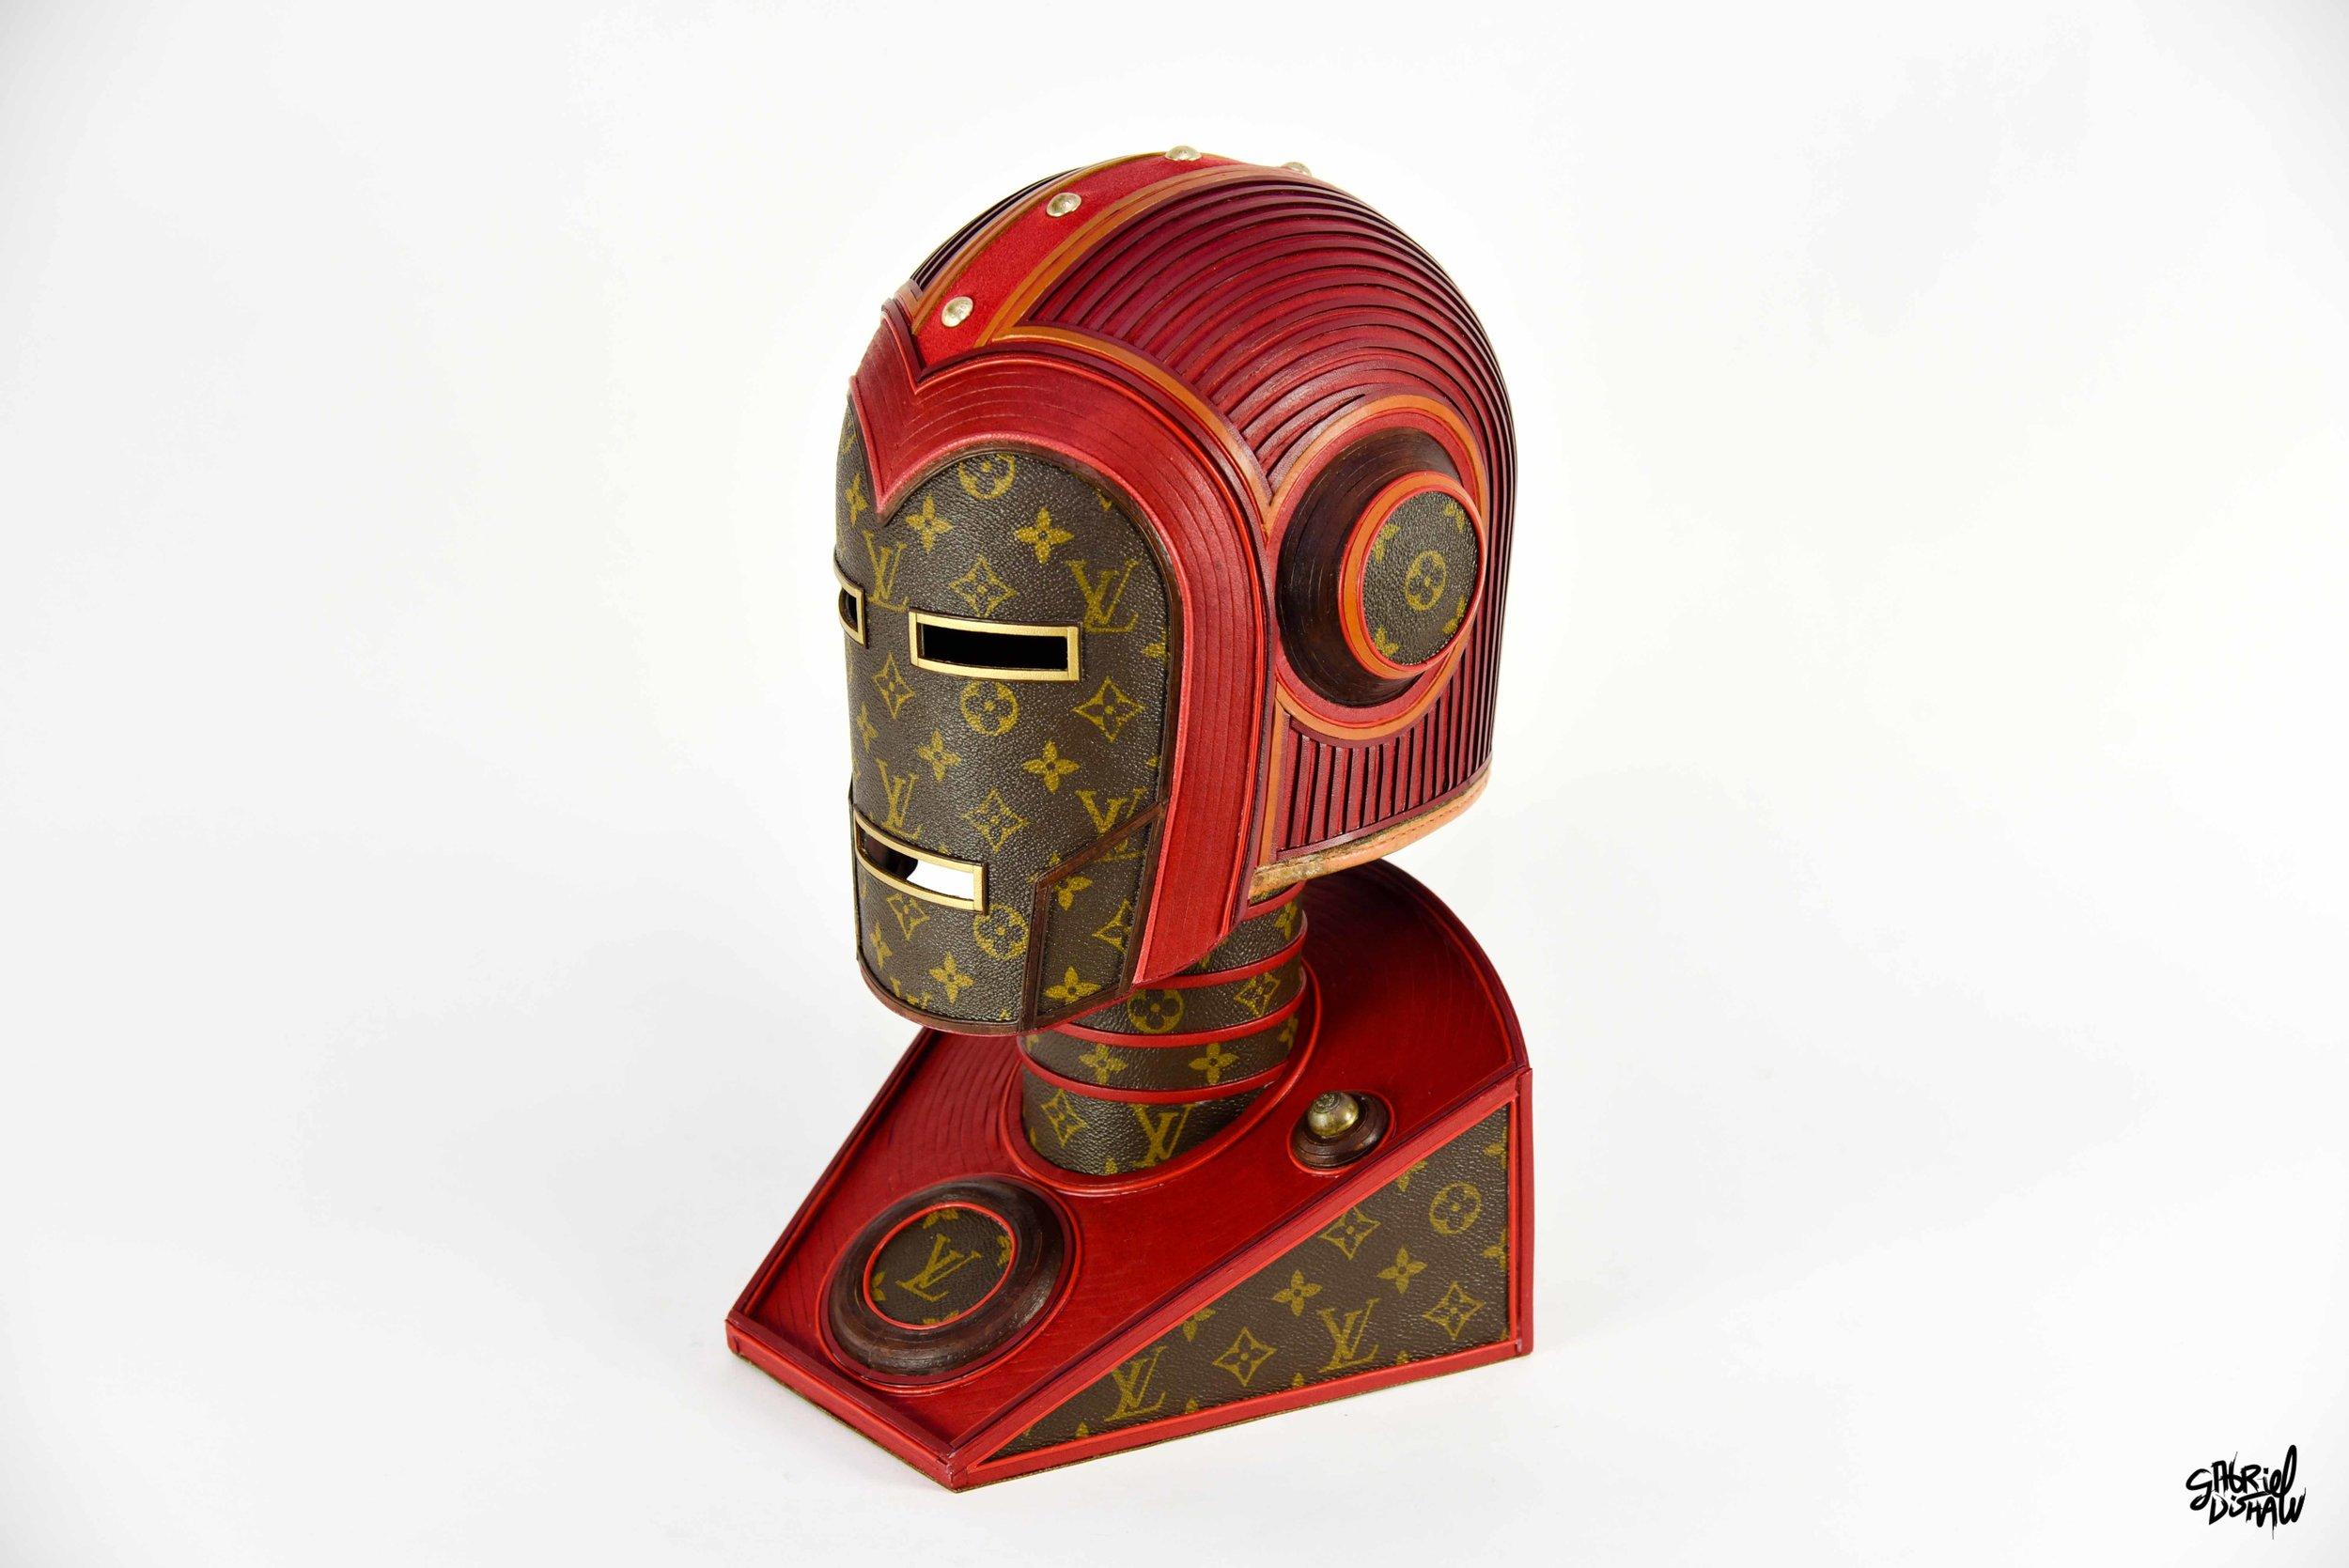 Gabriel Dishaw Vintage Iron Man LV-0169.jpg